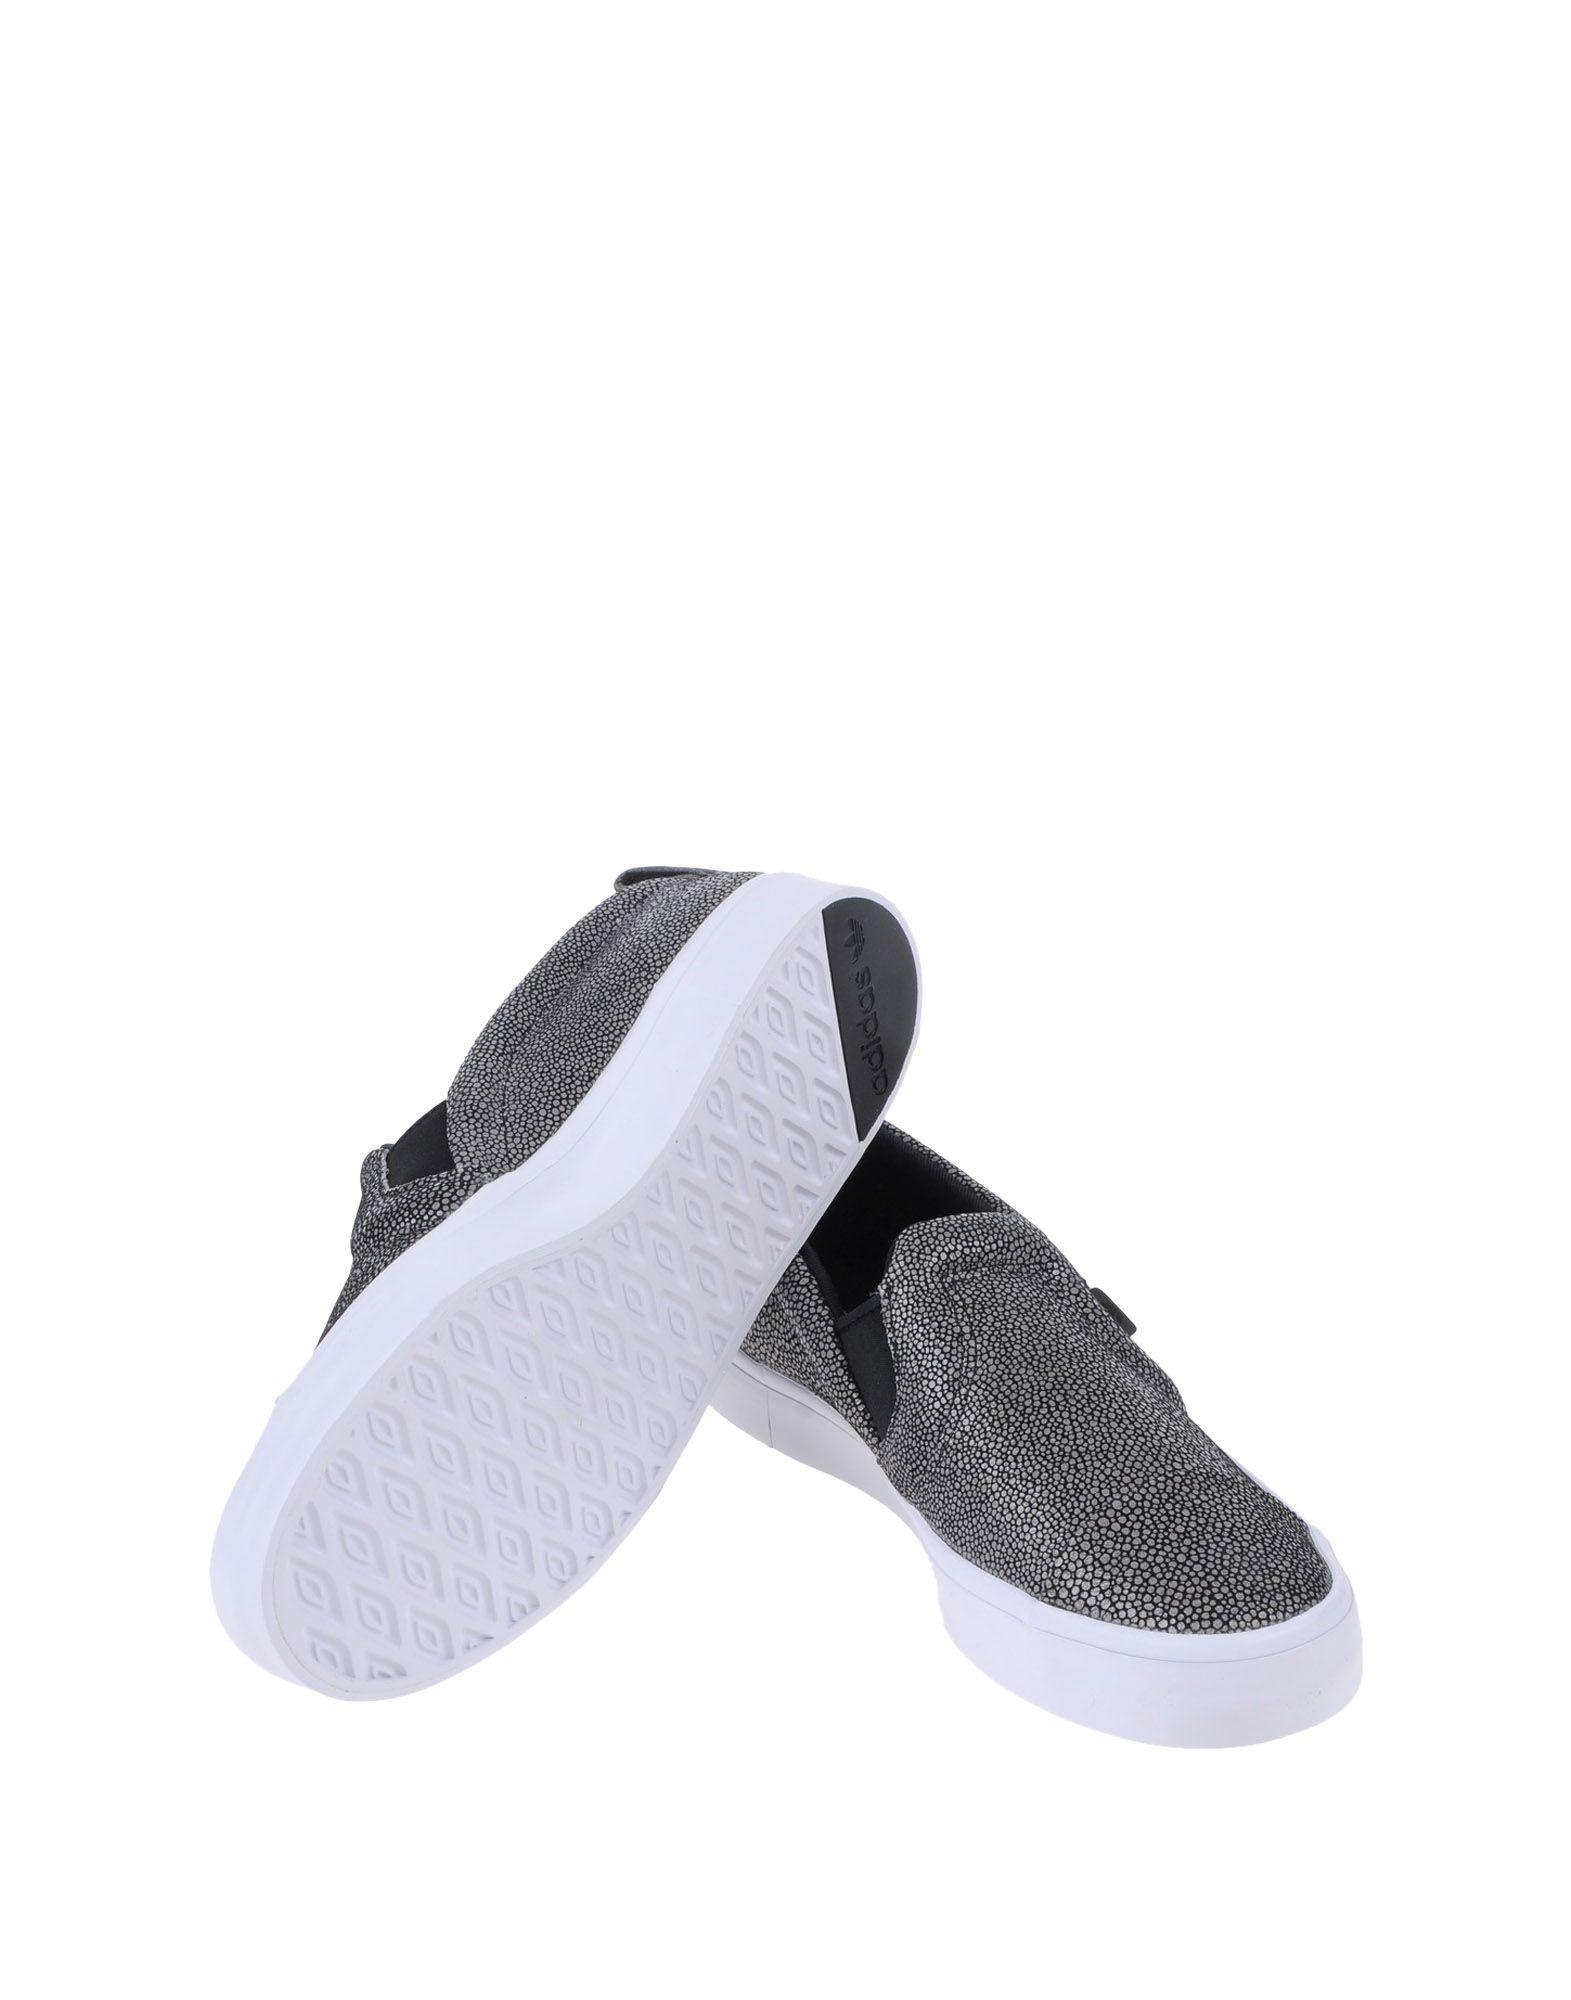 Sneakers Adidas Originals Honey 2.0 Slipon - Femme - Sneakers Adidas Originals sur